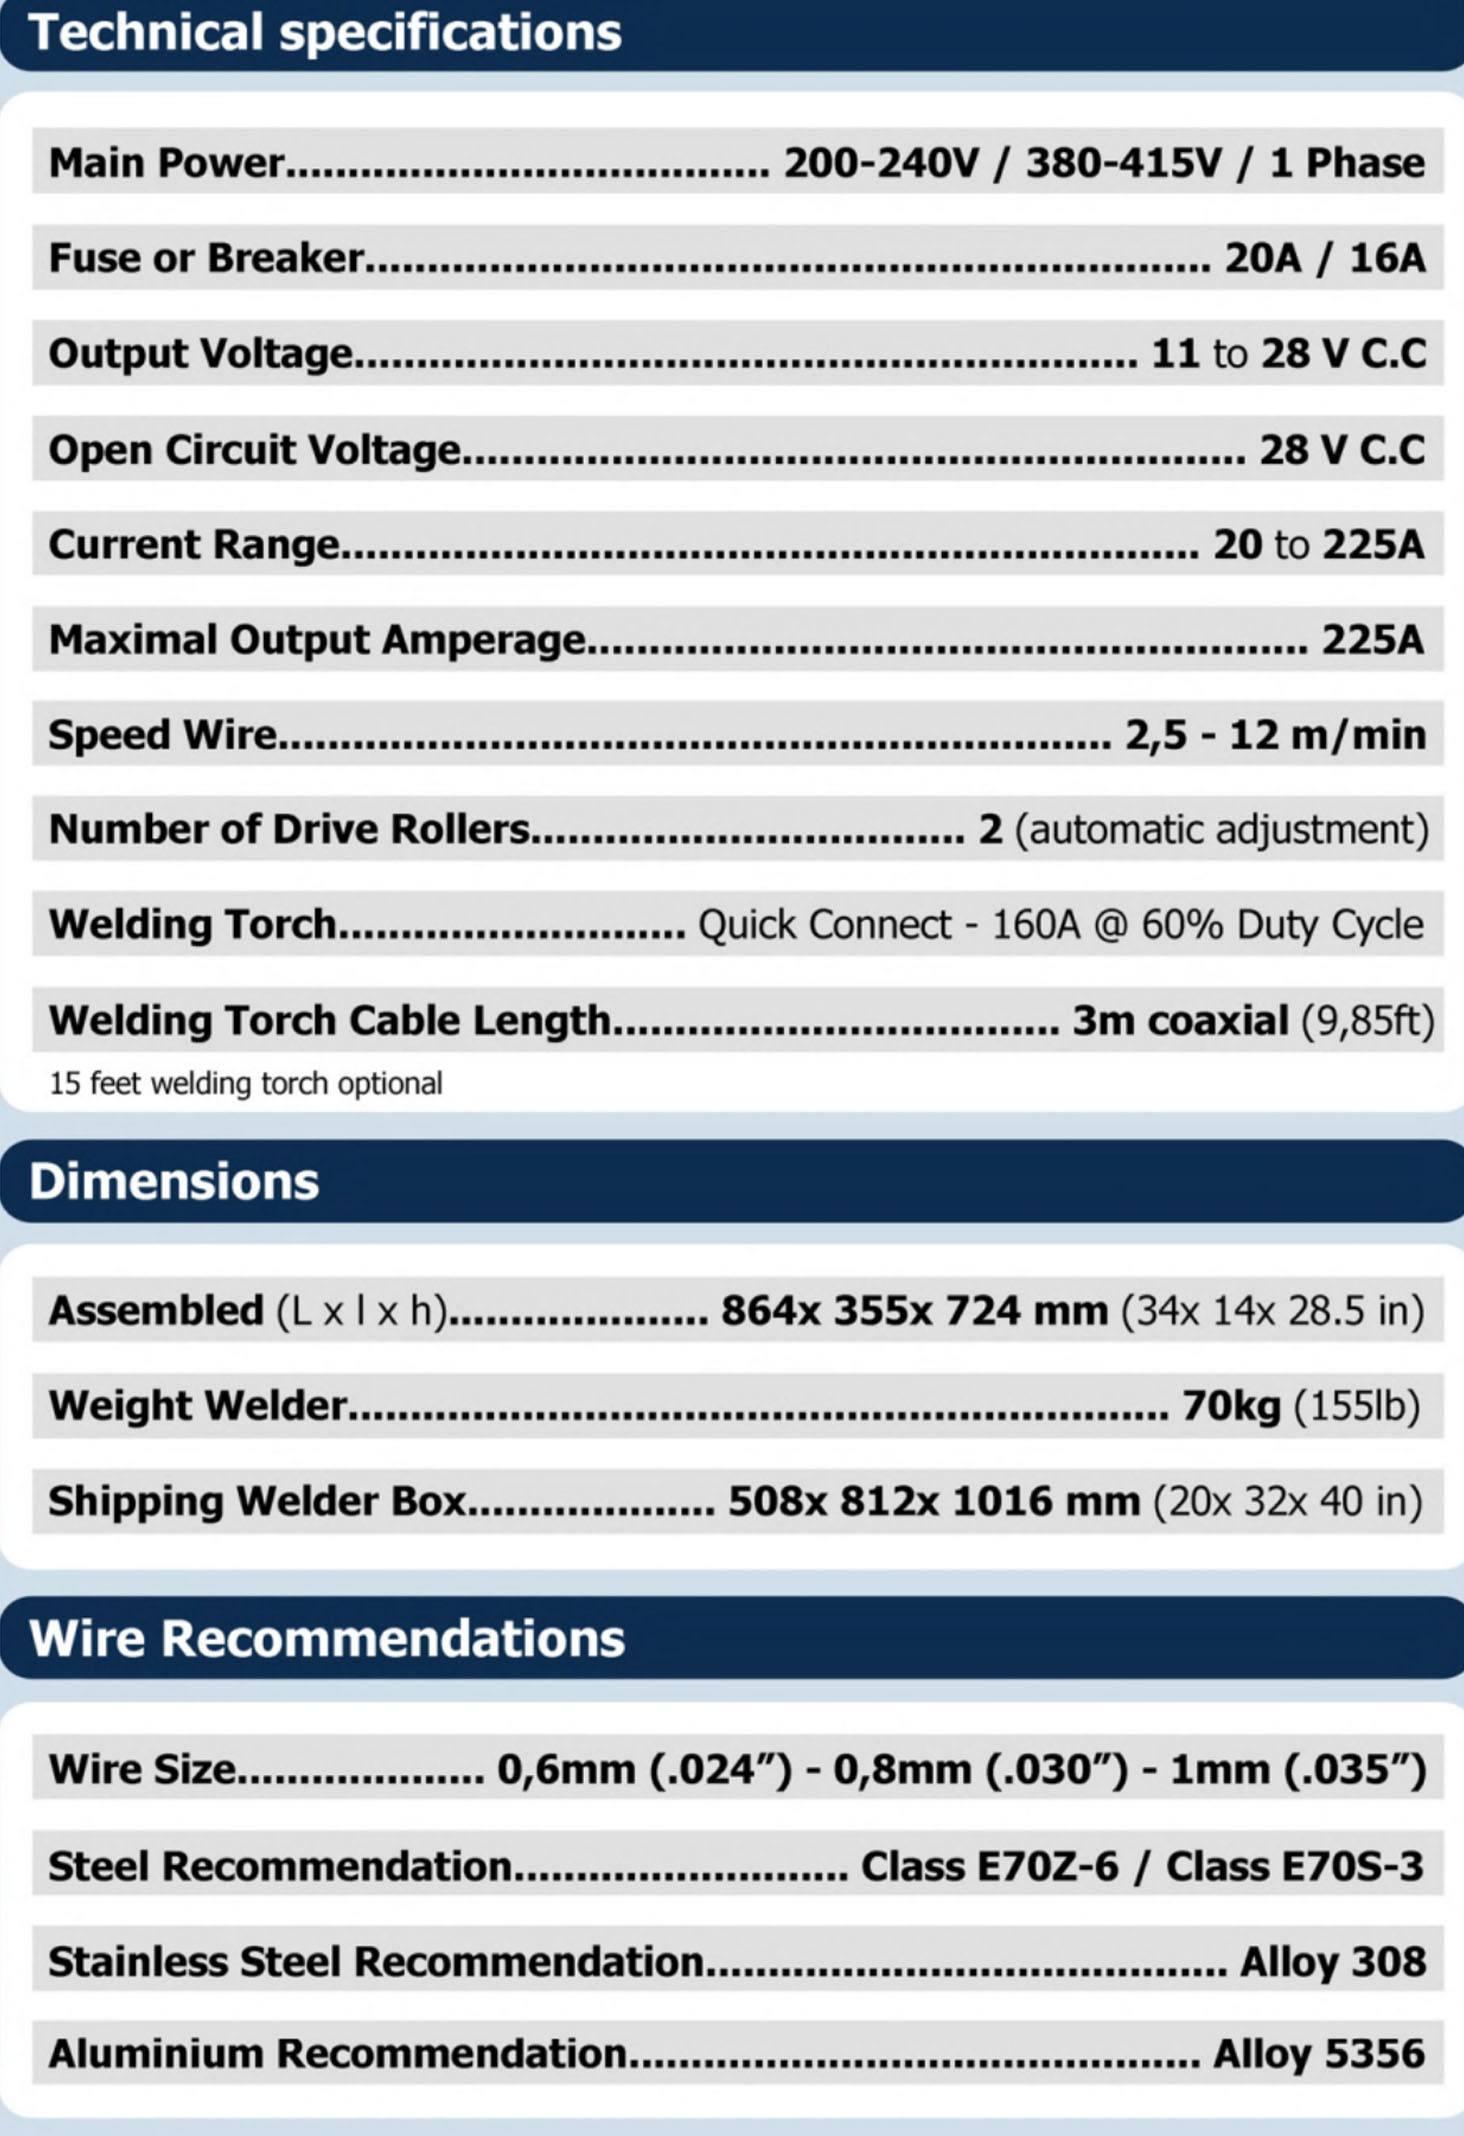 AMH UltraMig 200 Versatile MIG Welder for Autobody Repair Shop